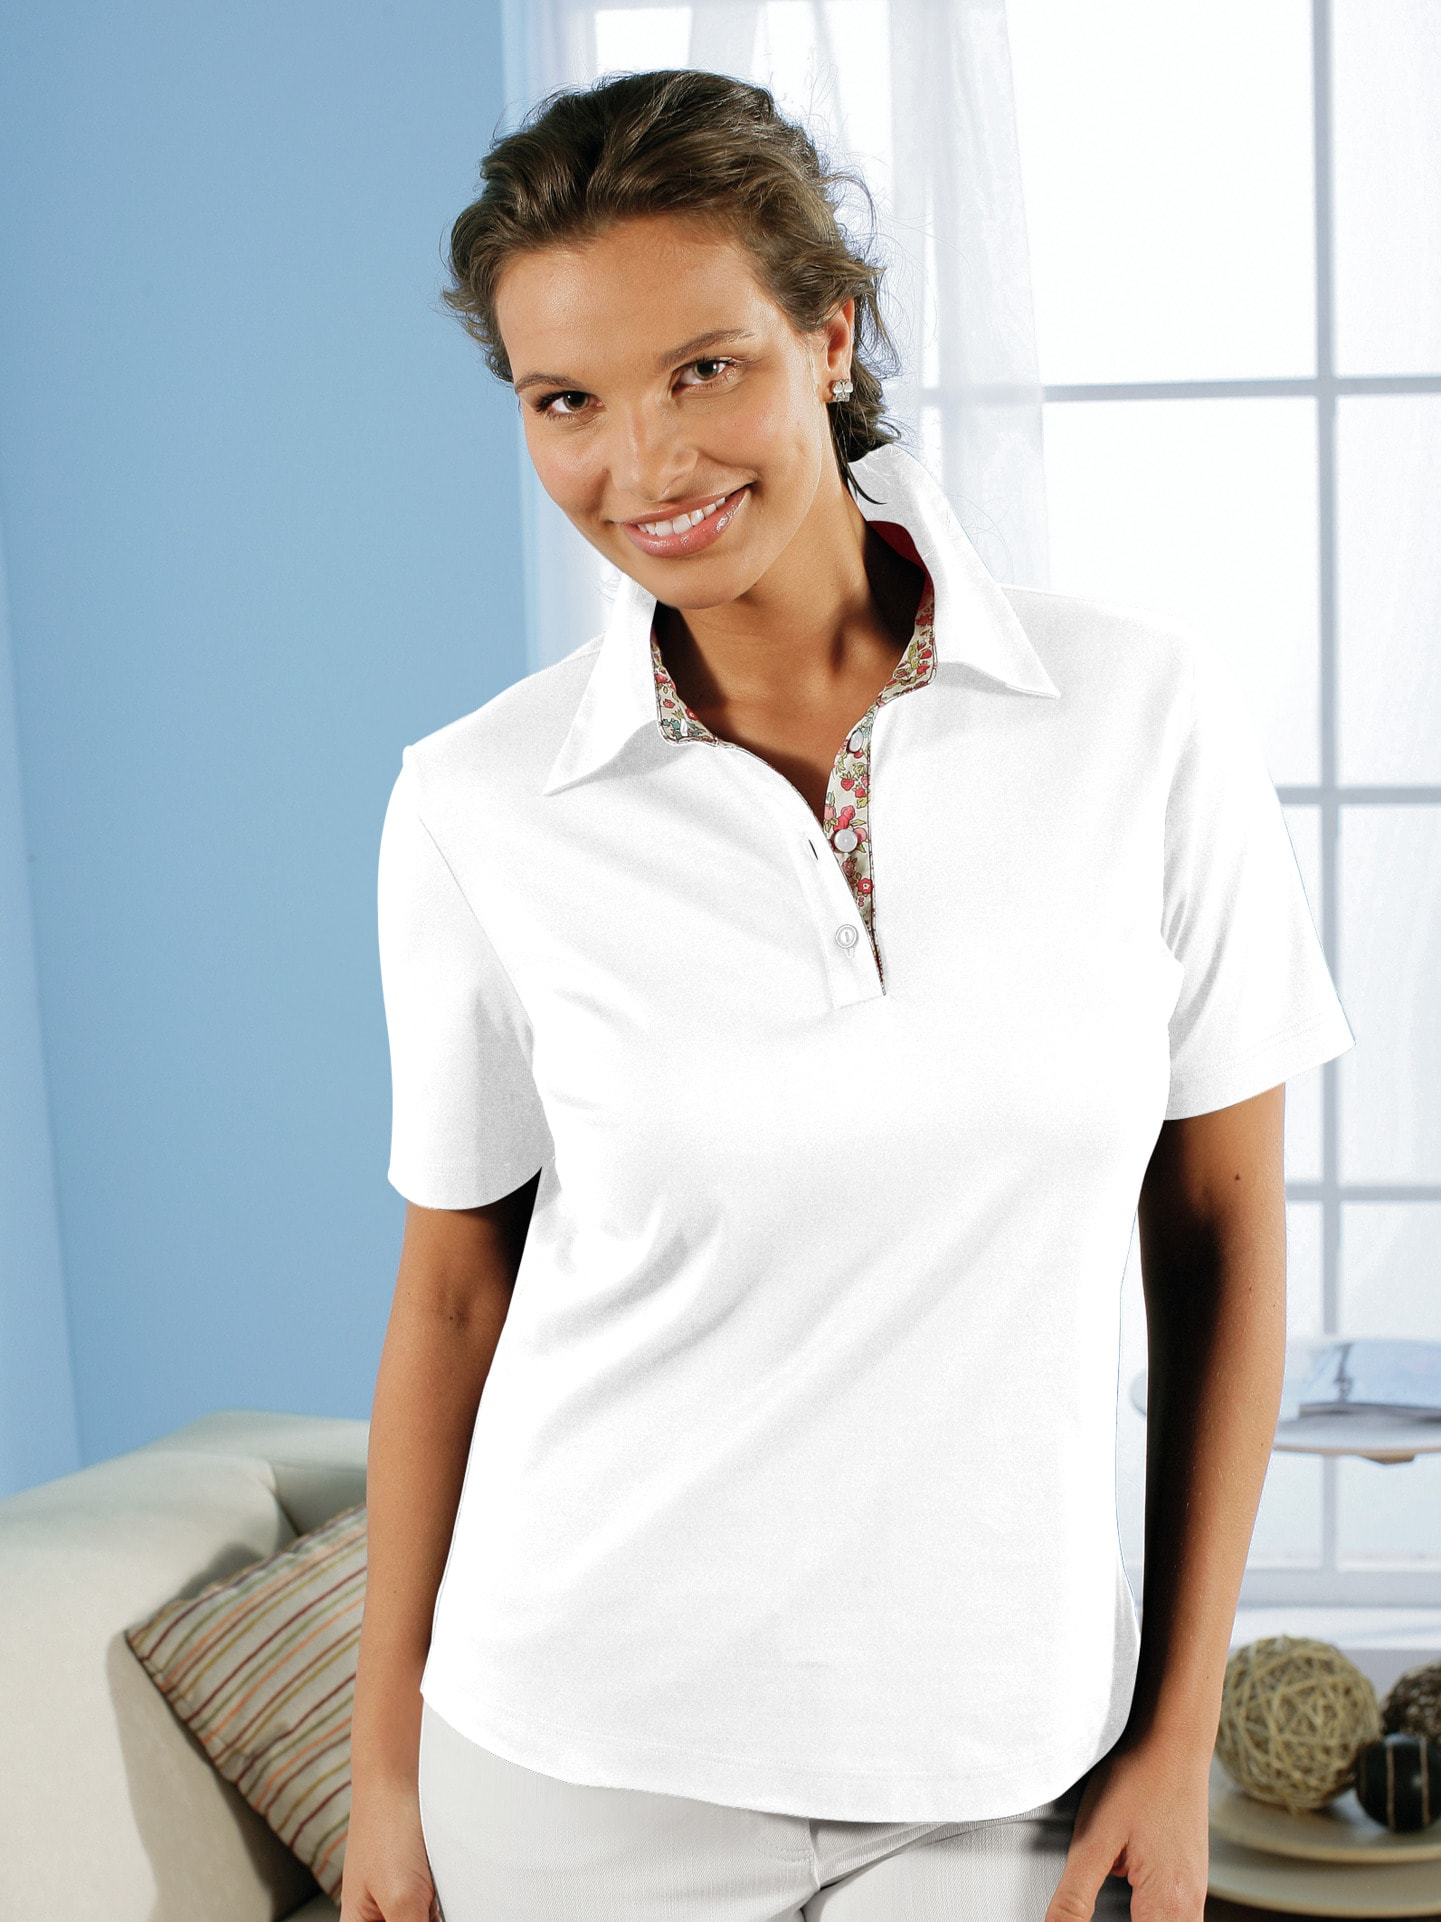 Avena Damen Aloe vera-Polo-Shirt Weiß 42-6010-9